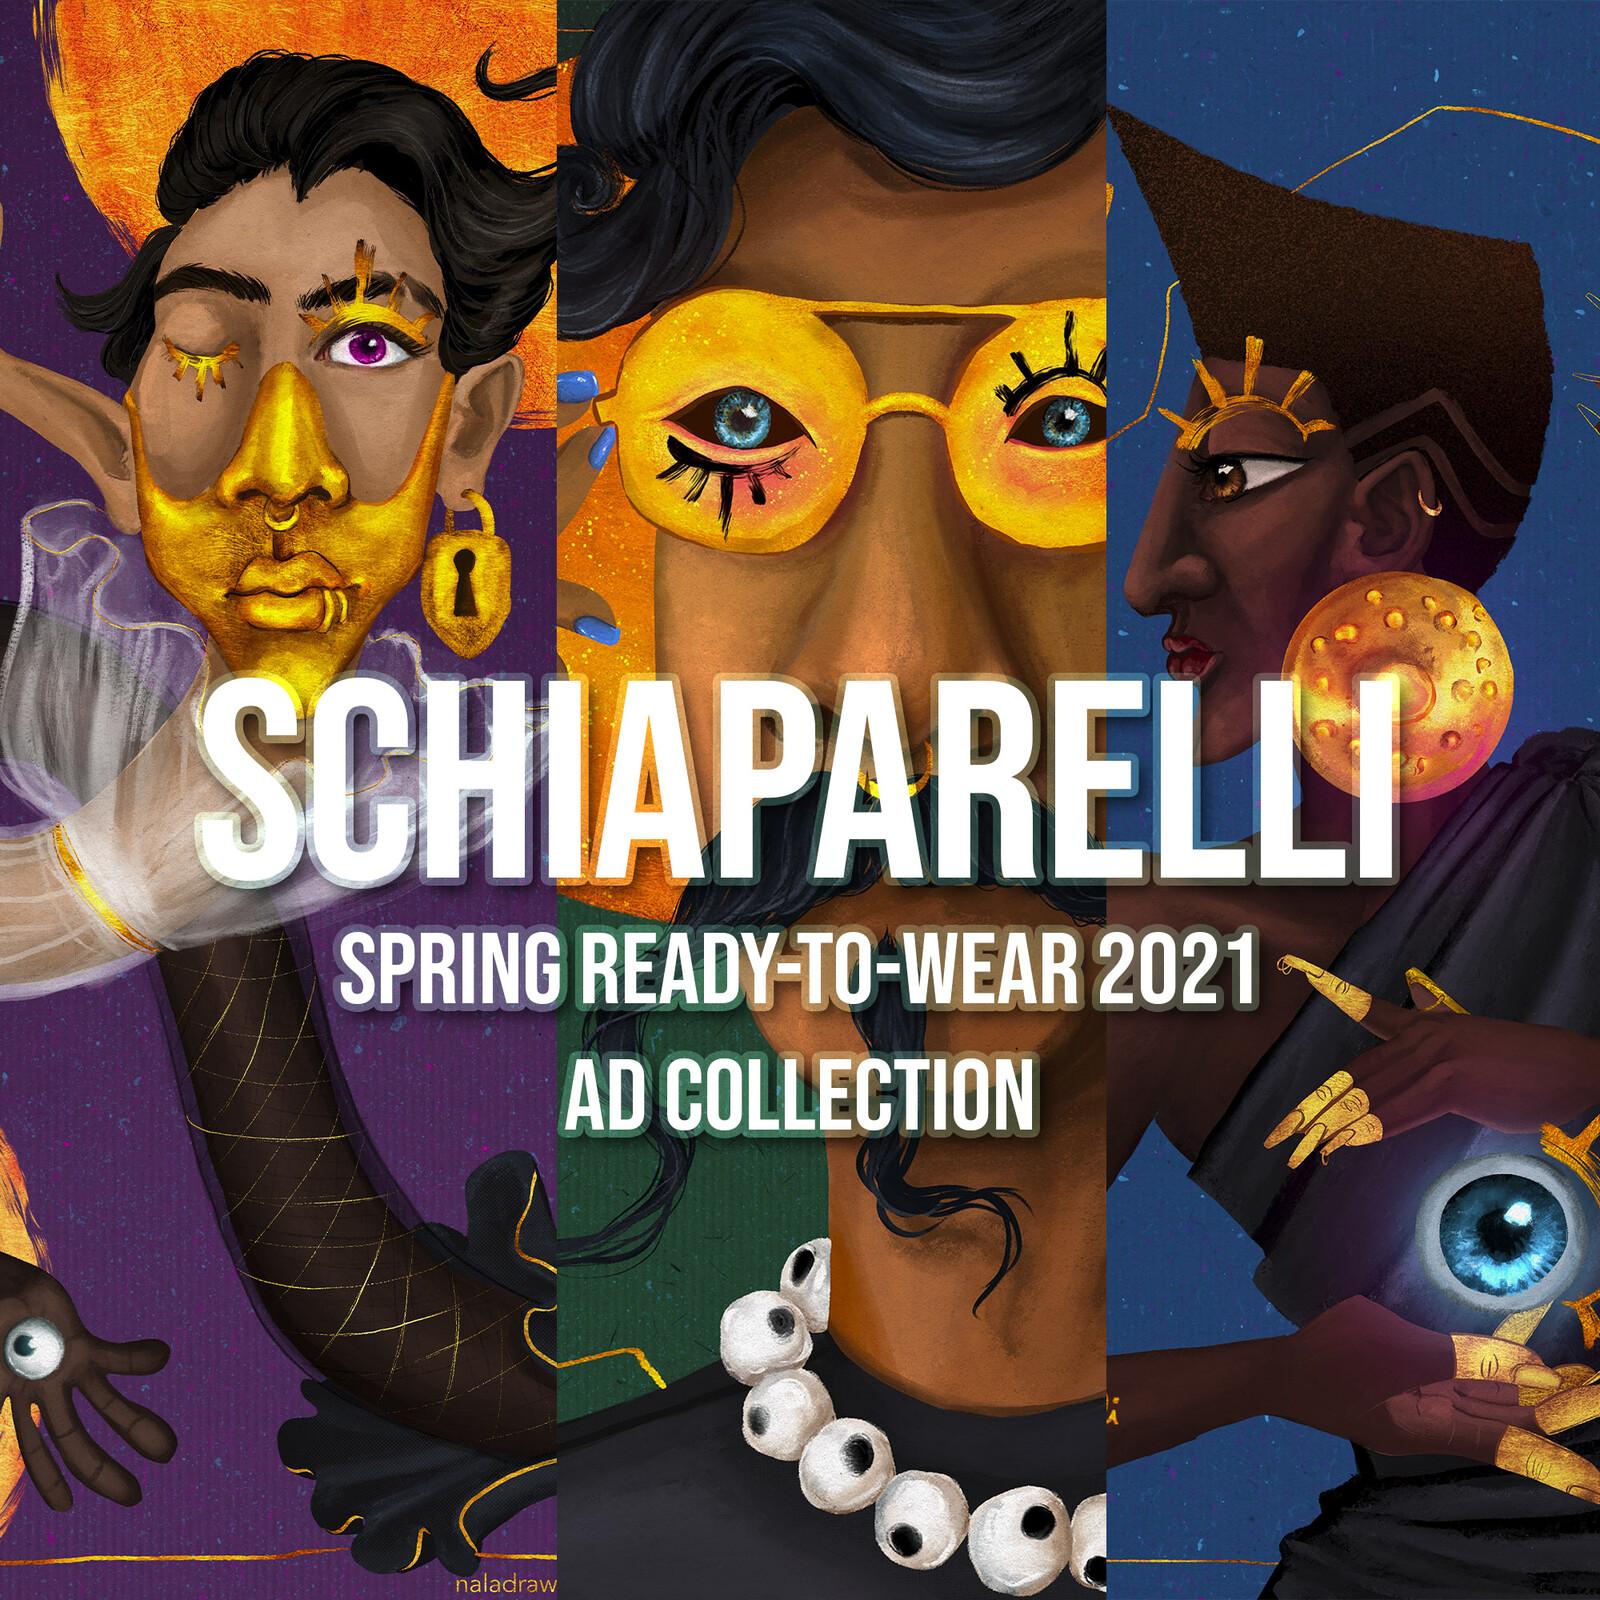 Advertising - Schiaparelli Spring Ready-to-Wear 2021